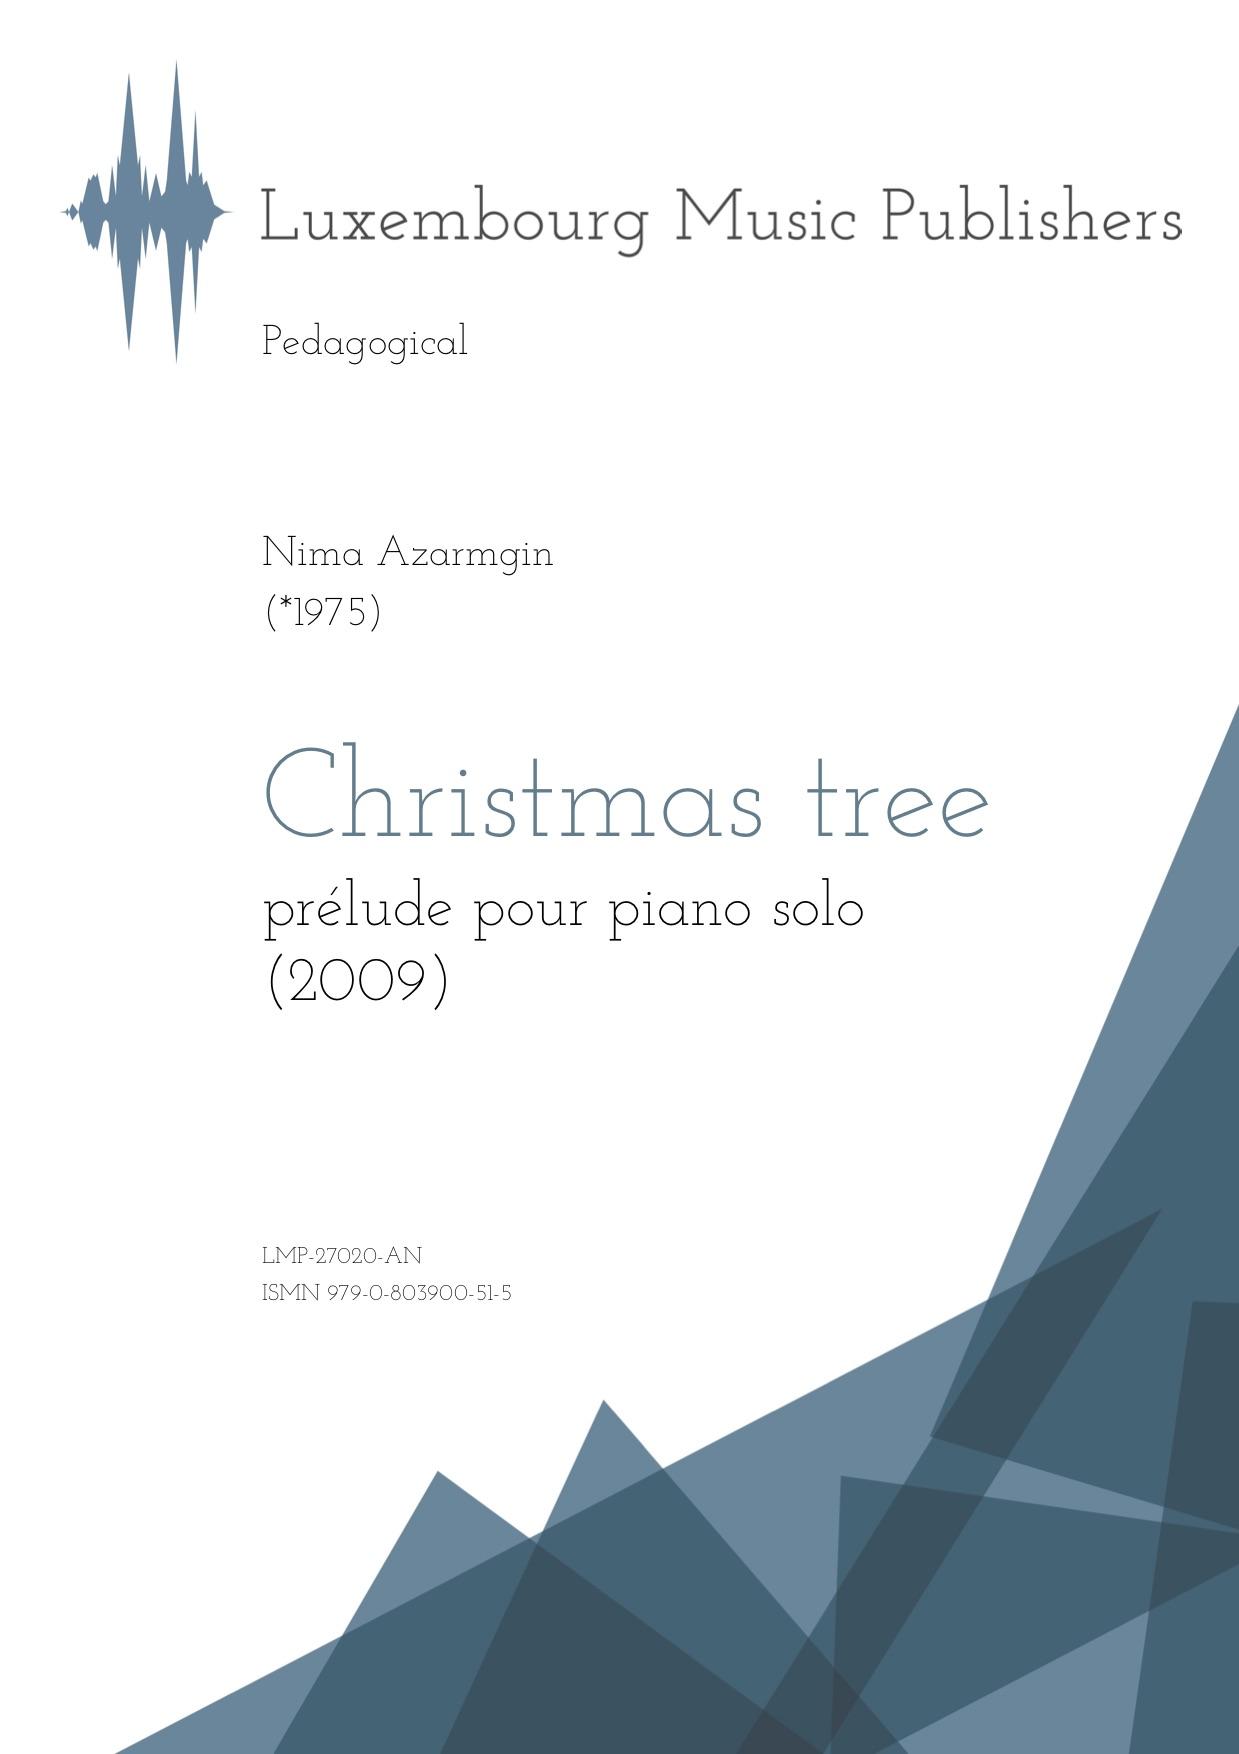 Christmas tree. Sheet Music by Nima Azarmgin, composer. Music for piano solo. Contemporary piano music. Music with a christian theme. Christmas music.